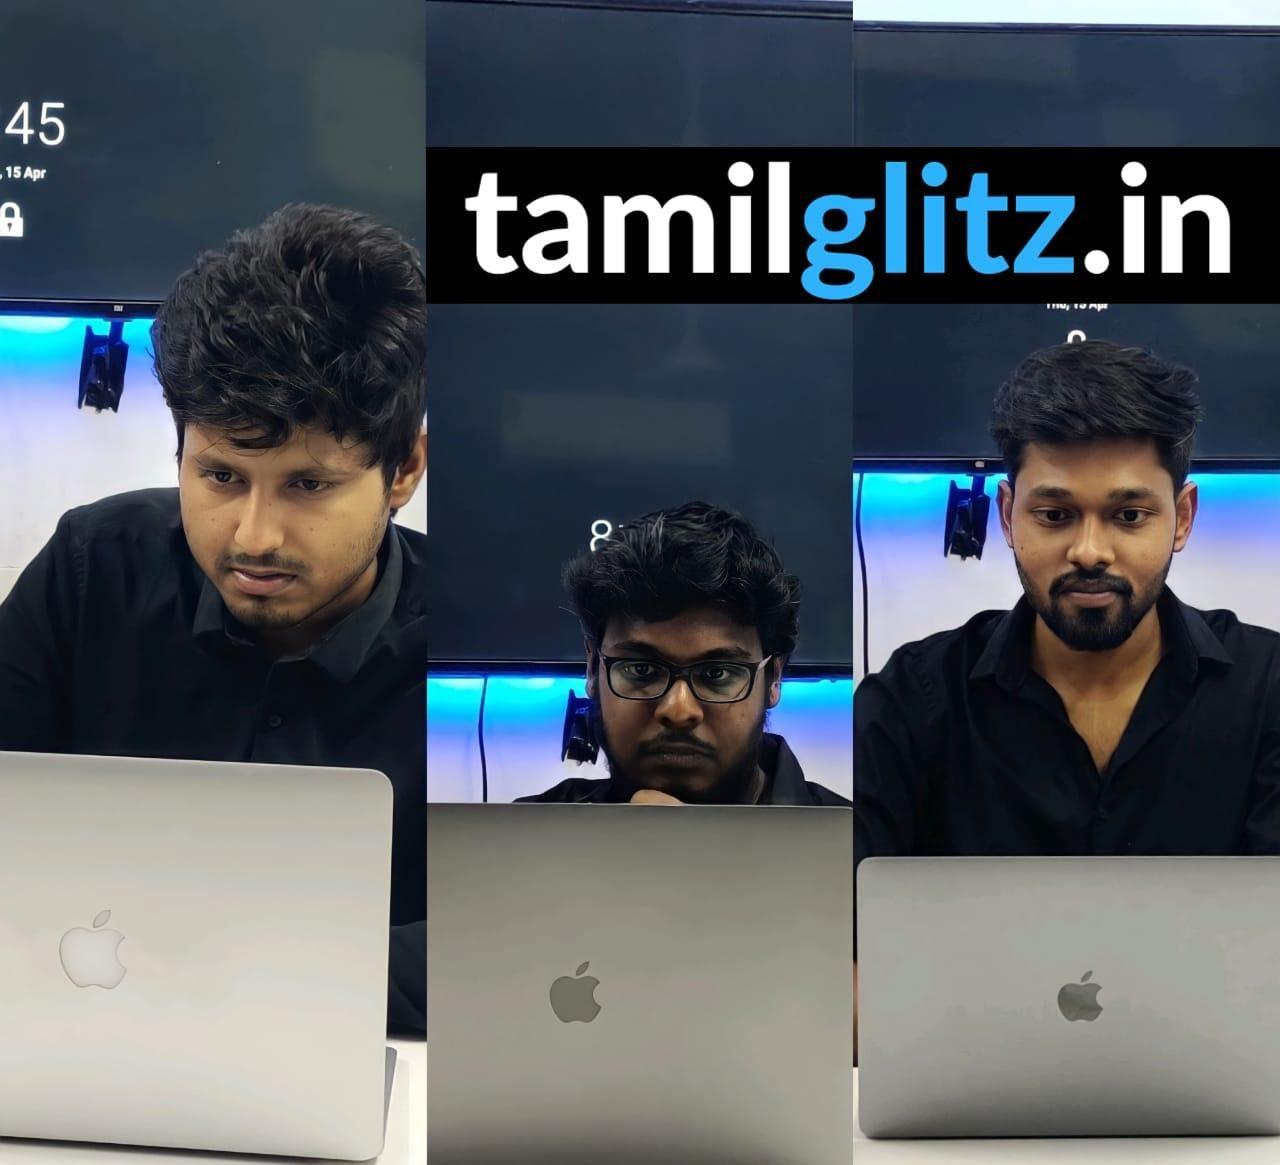 TamilGlitz Media Has Audience From International Tamil-Speaking Community